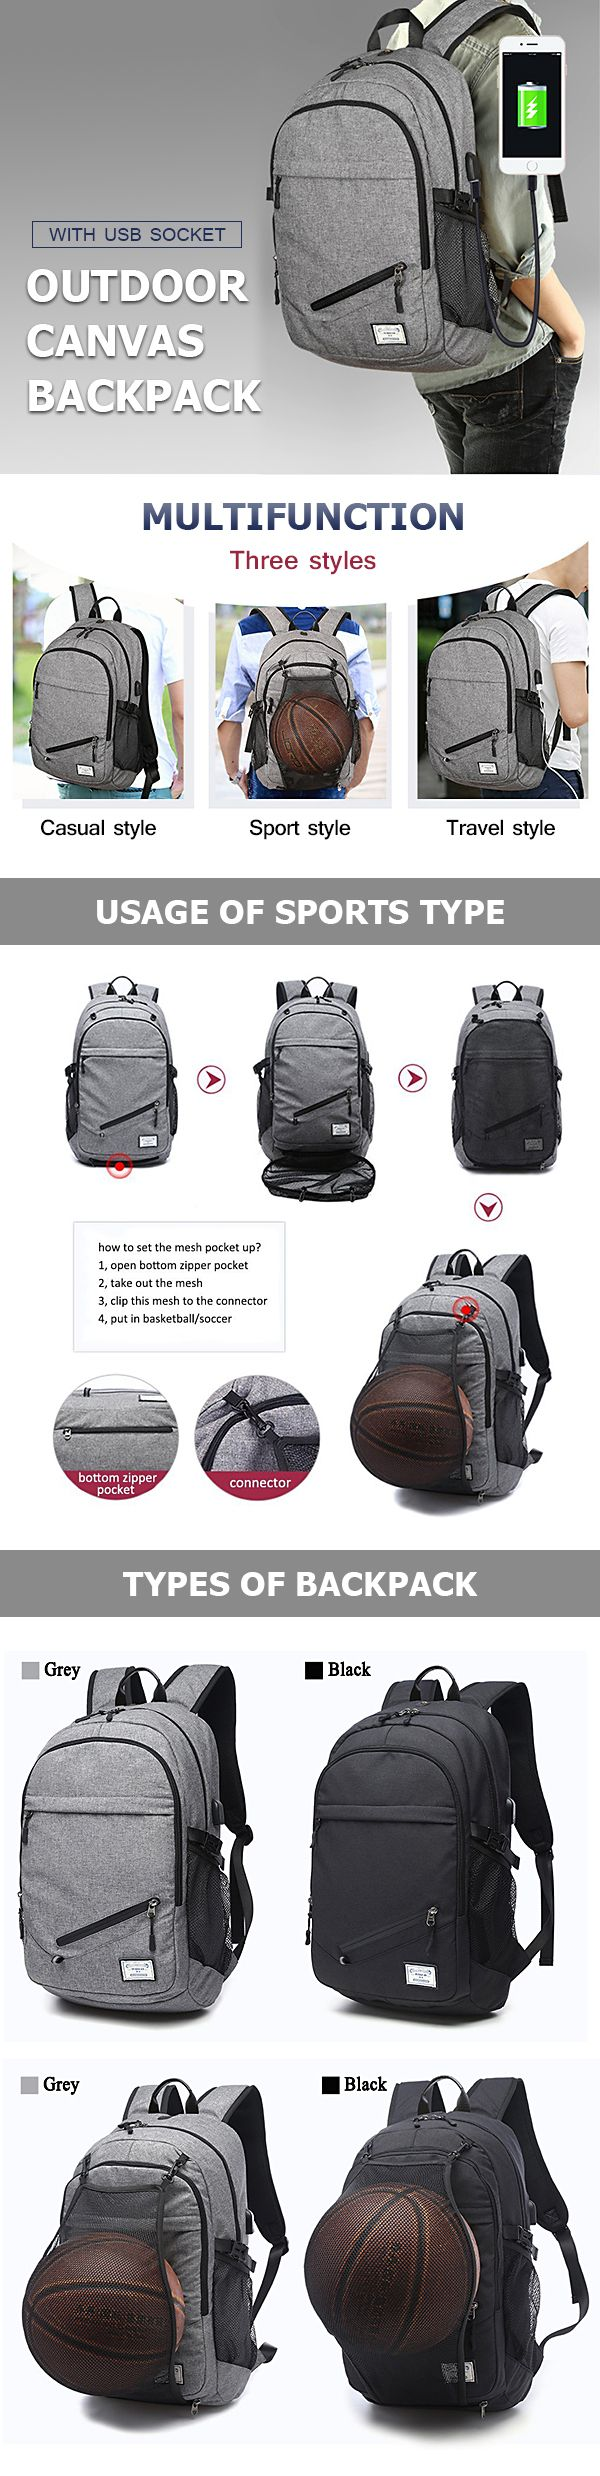 US$32.94 Outdoor Travel Canvas Backpack 17'' Laptop Bag Basketball Bag With USB Socket